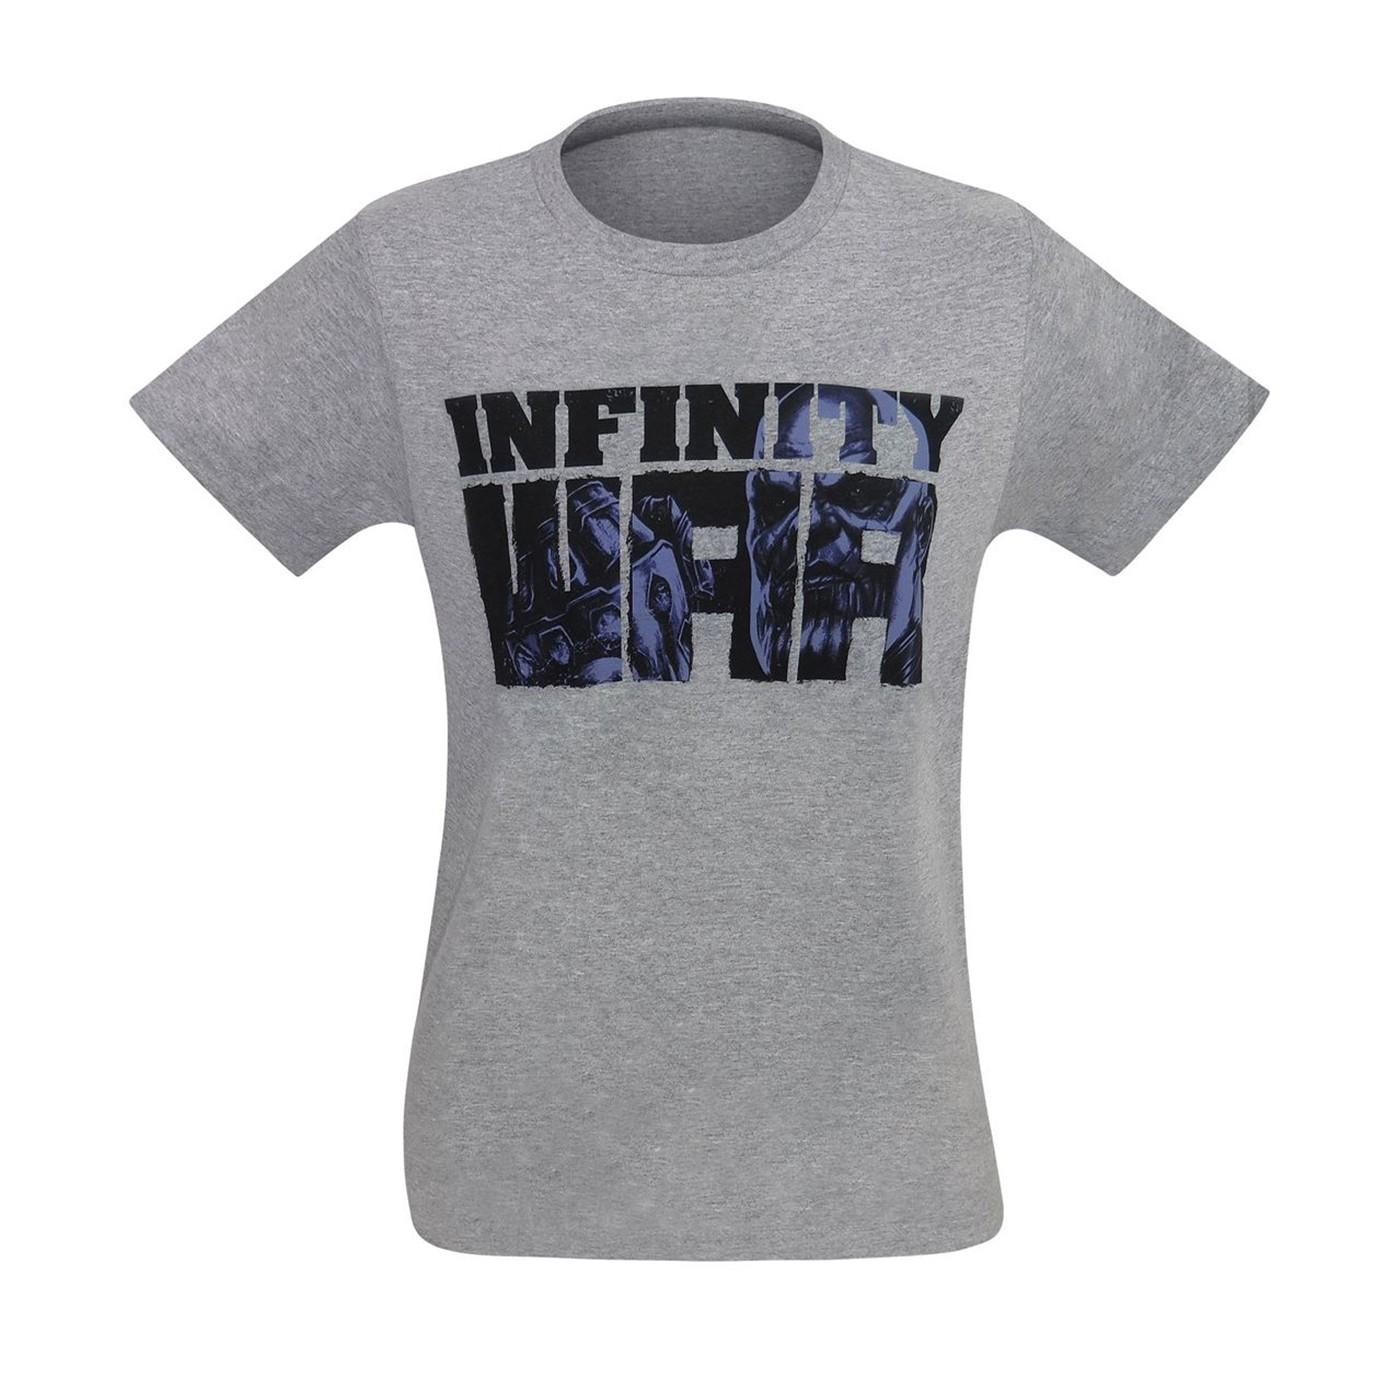 Infinity War Thanos Vs Earth's Mightiest Men's T-Shirt